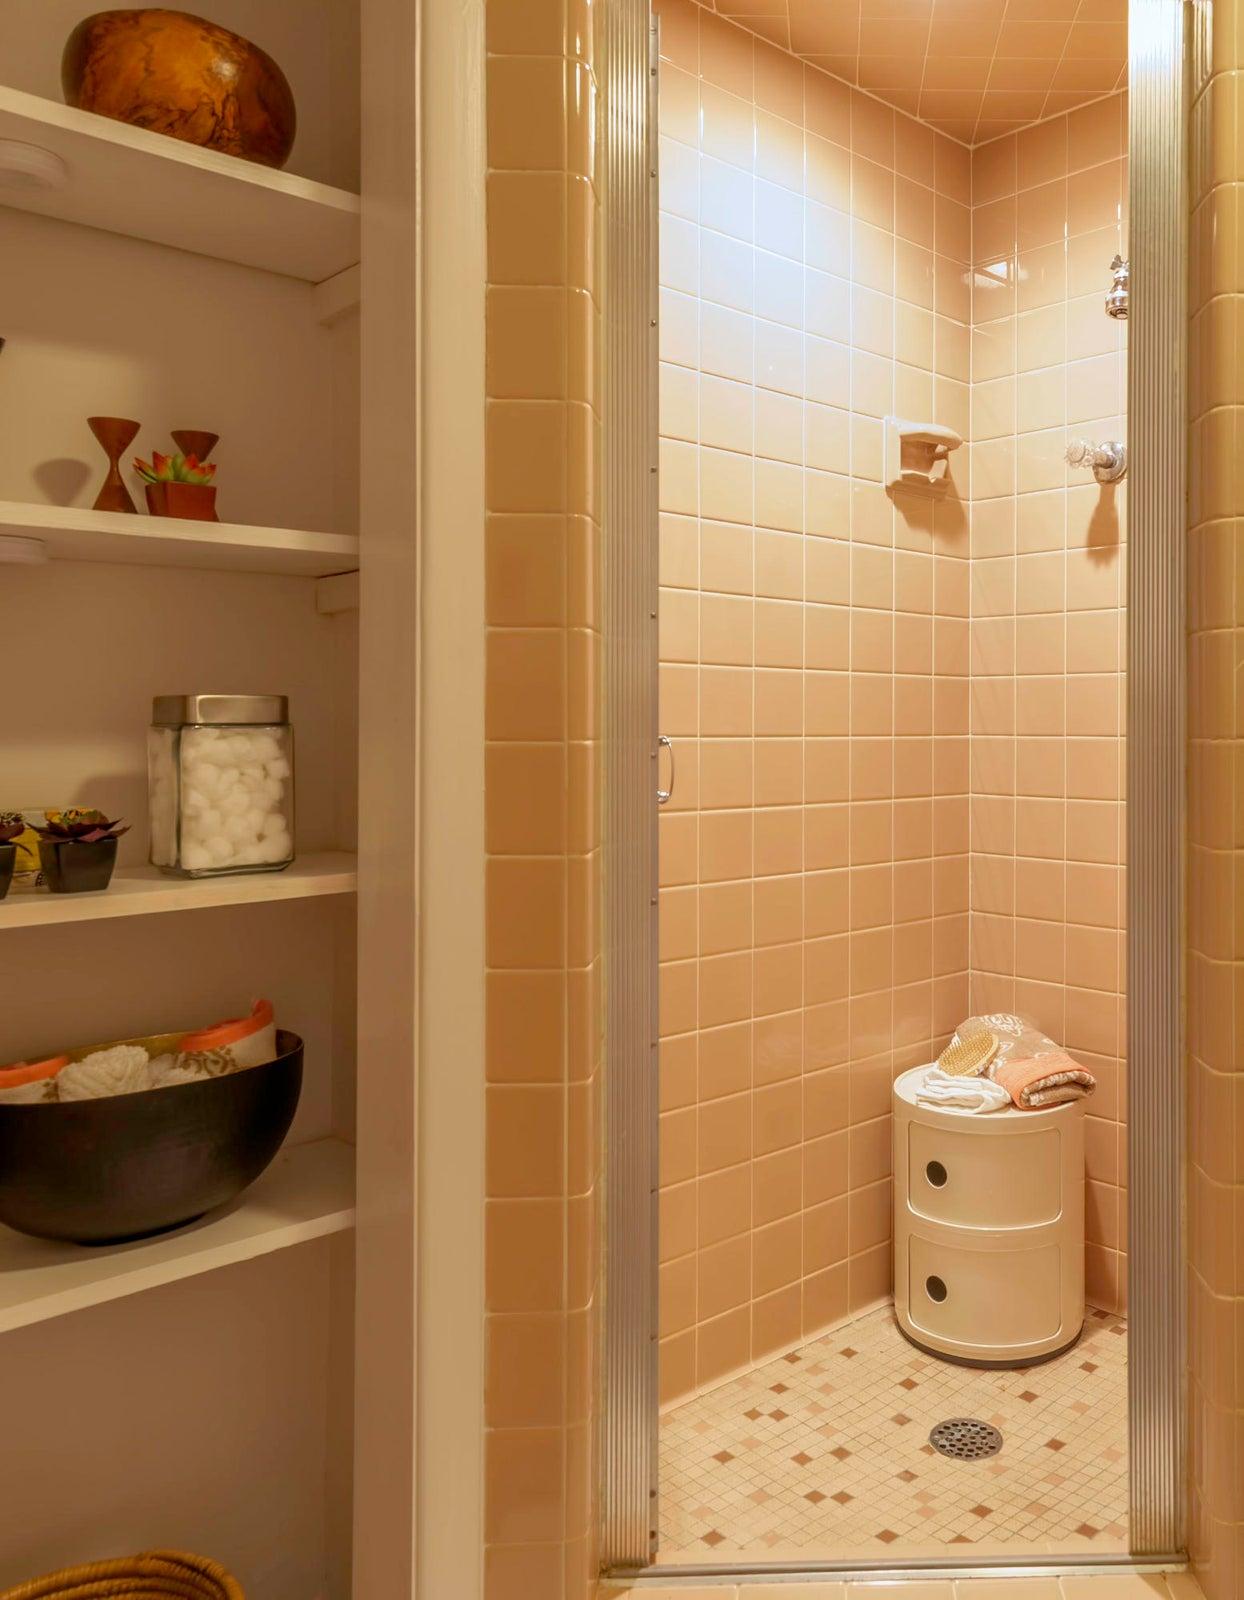 DSC_2099 - Downstairs Bathroom